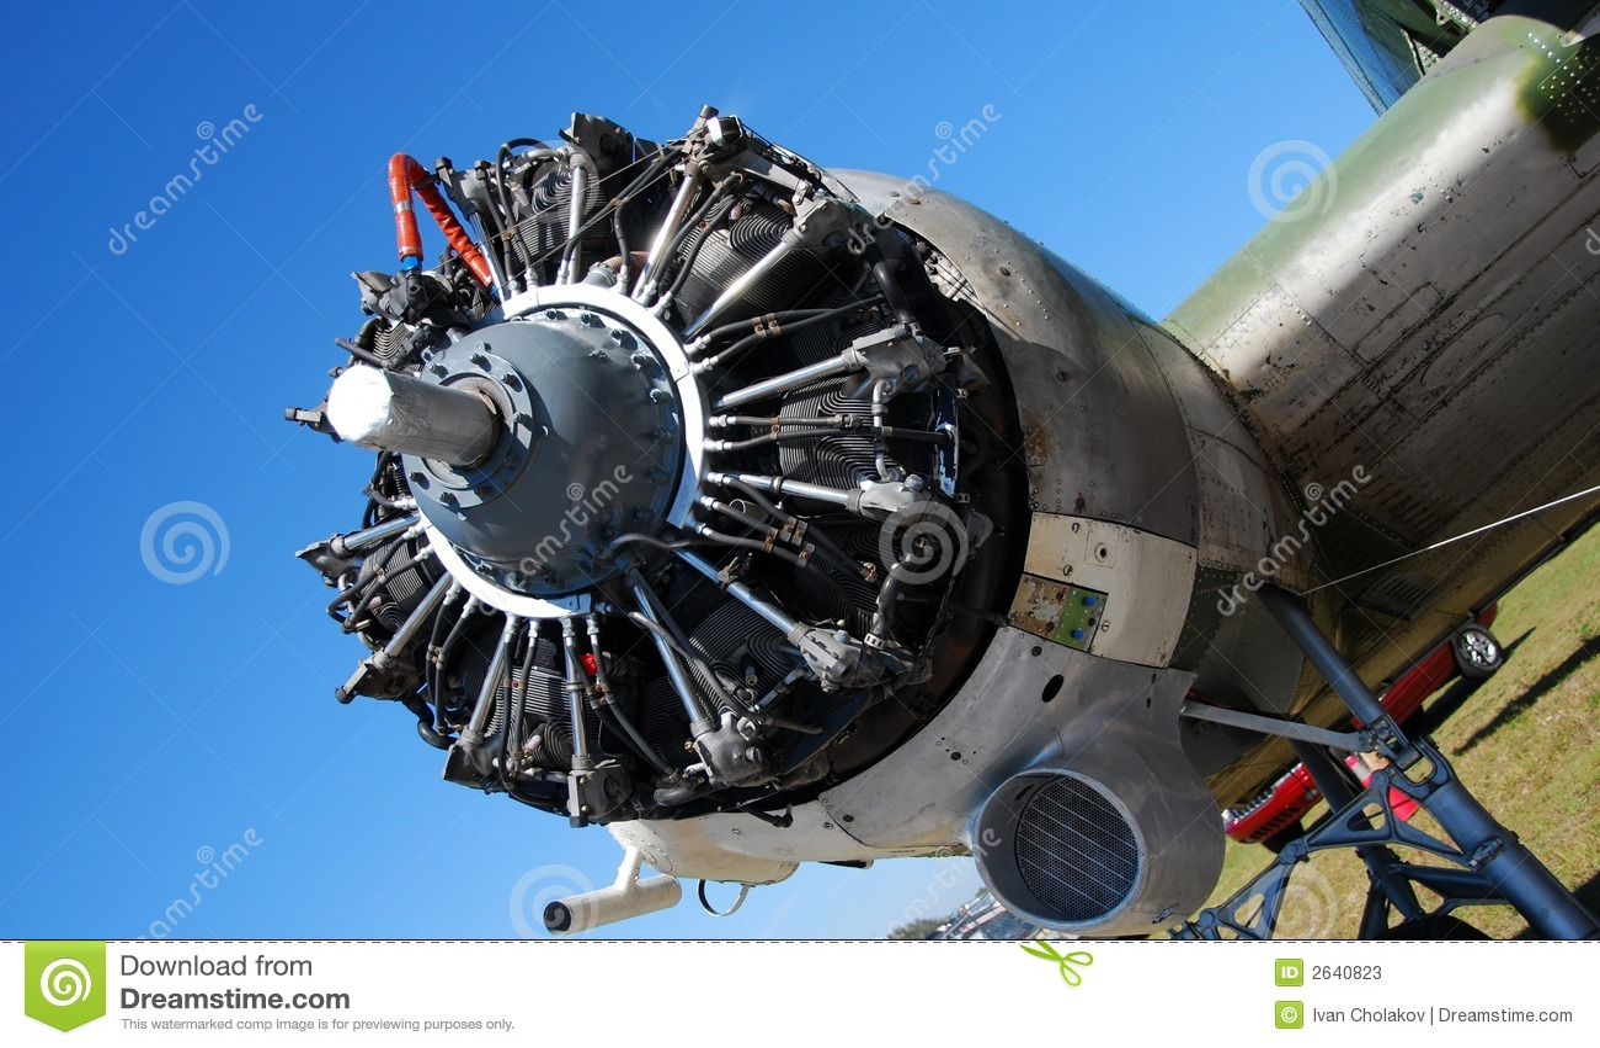 Vintage Aircraft Engines 117